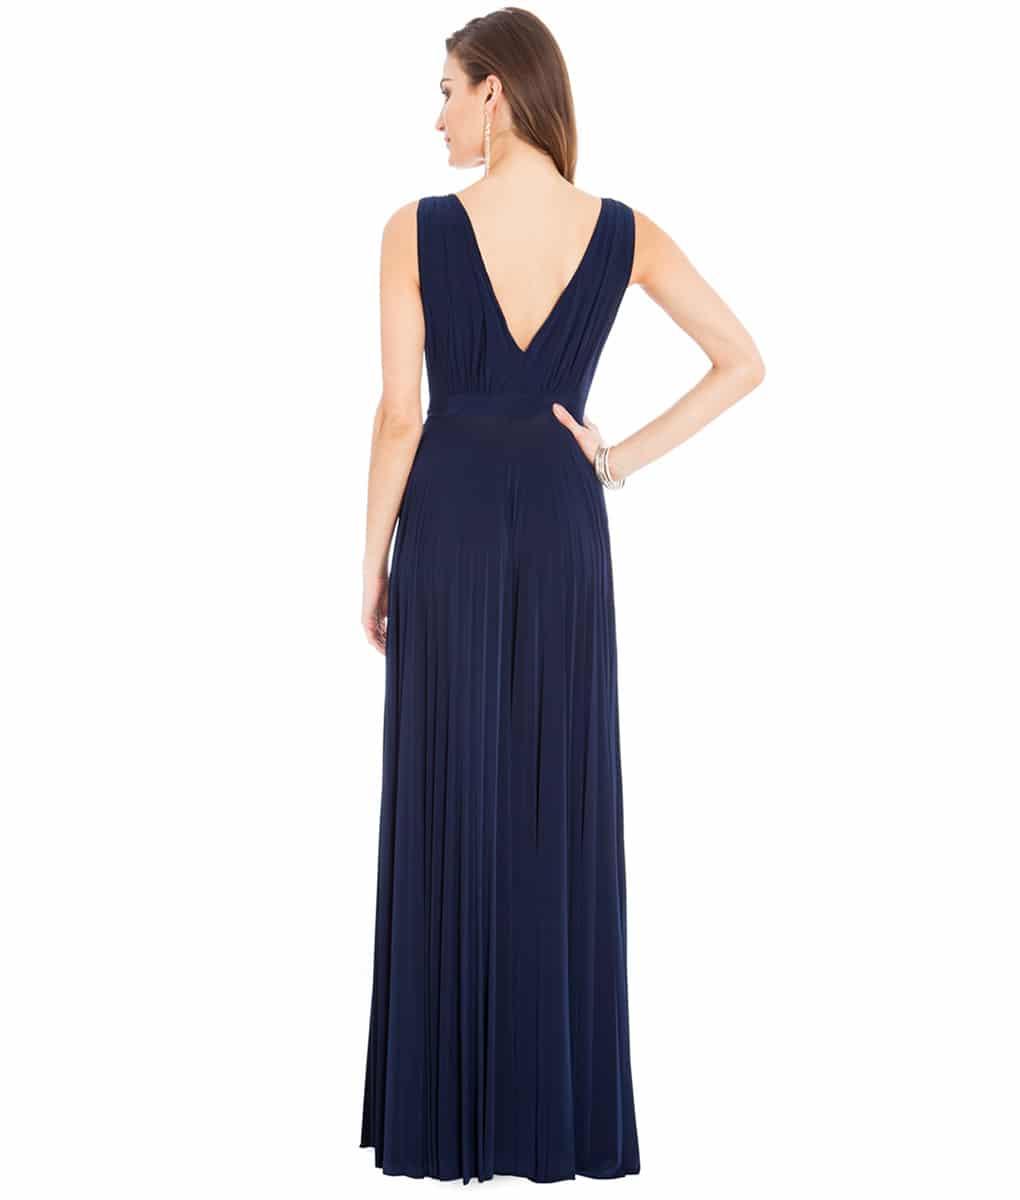 Alila-navy-plunge-bridesmaid-dress-city-goddess